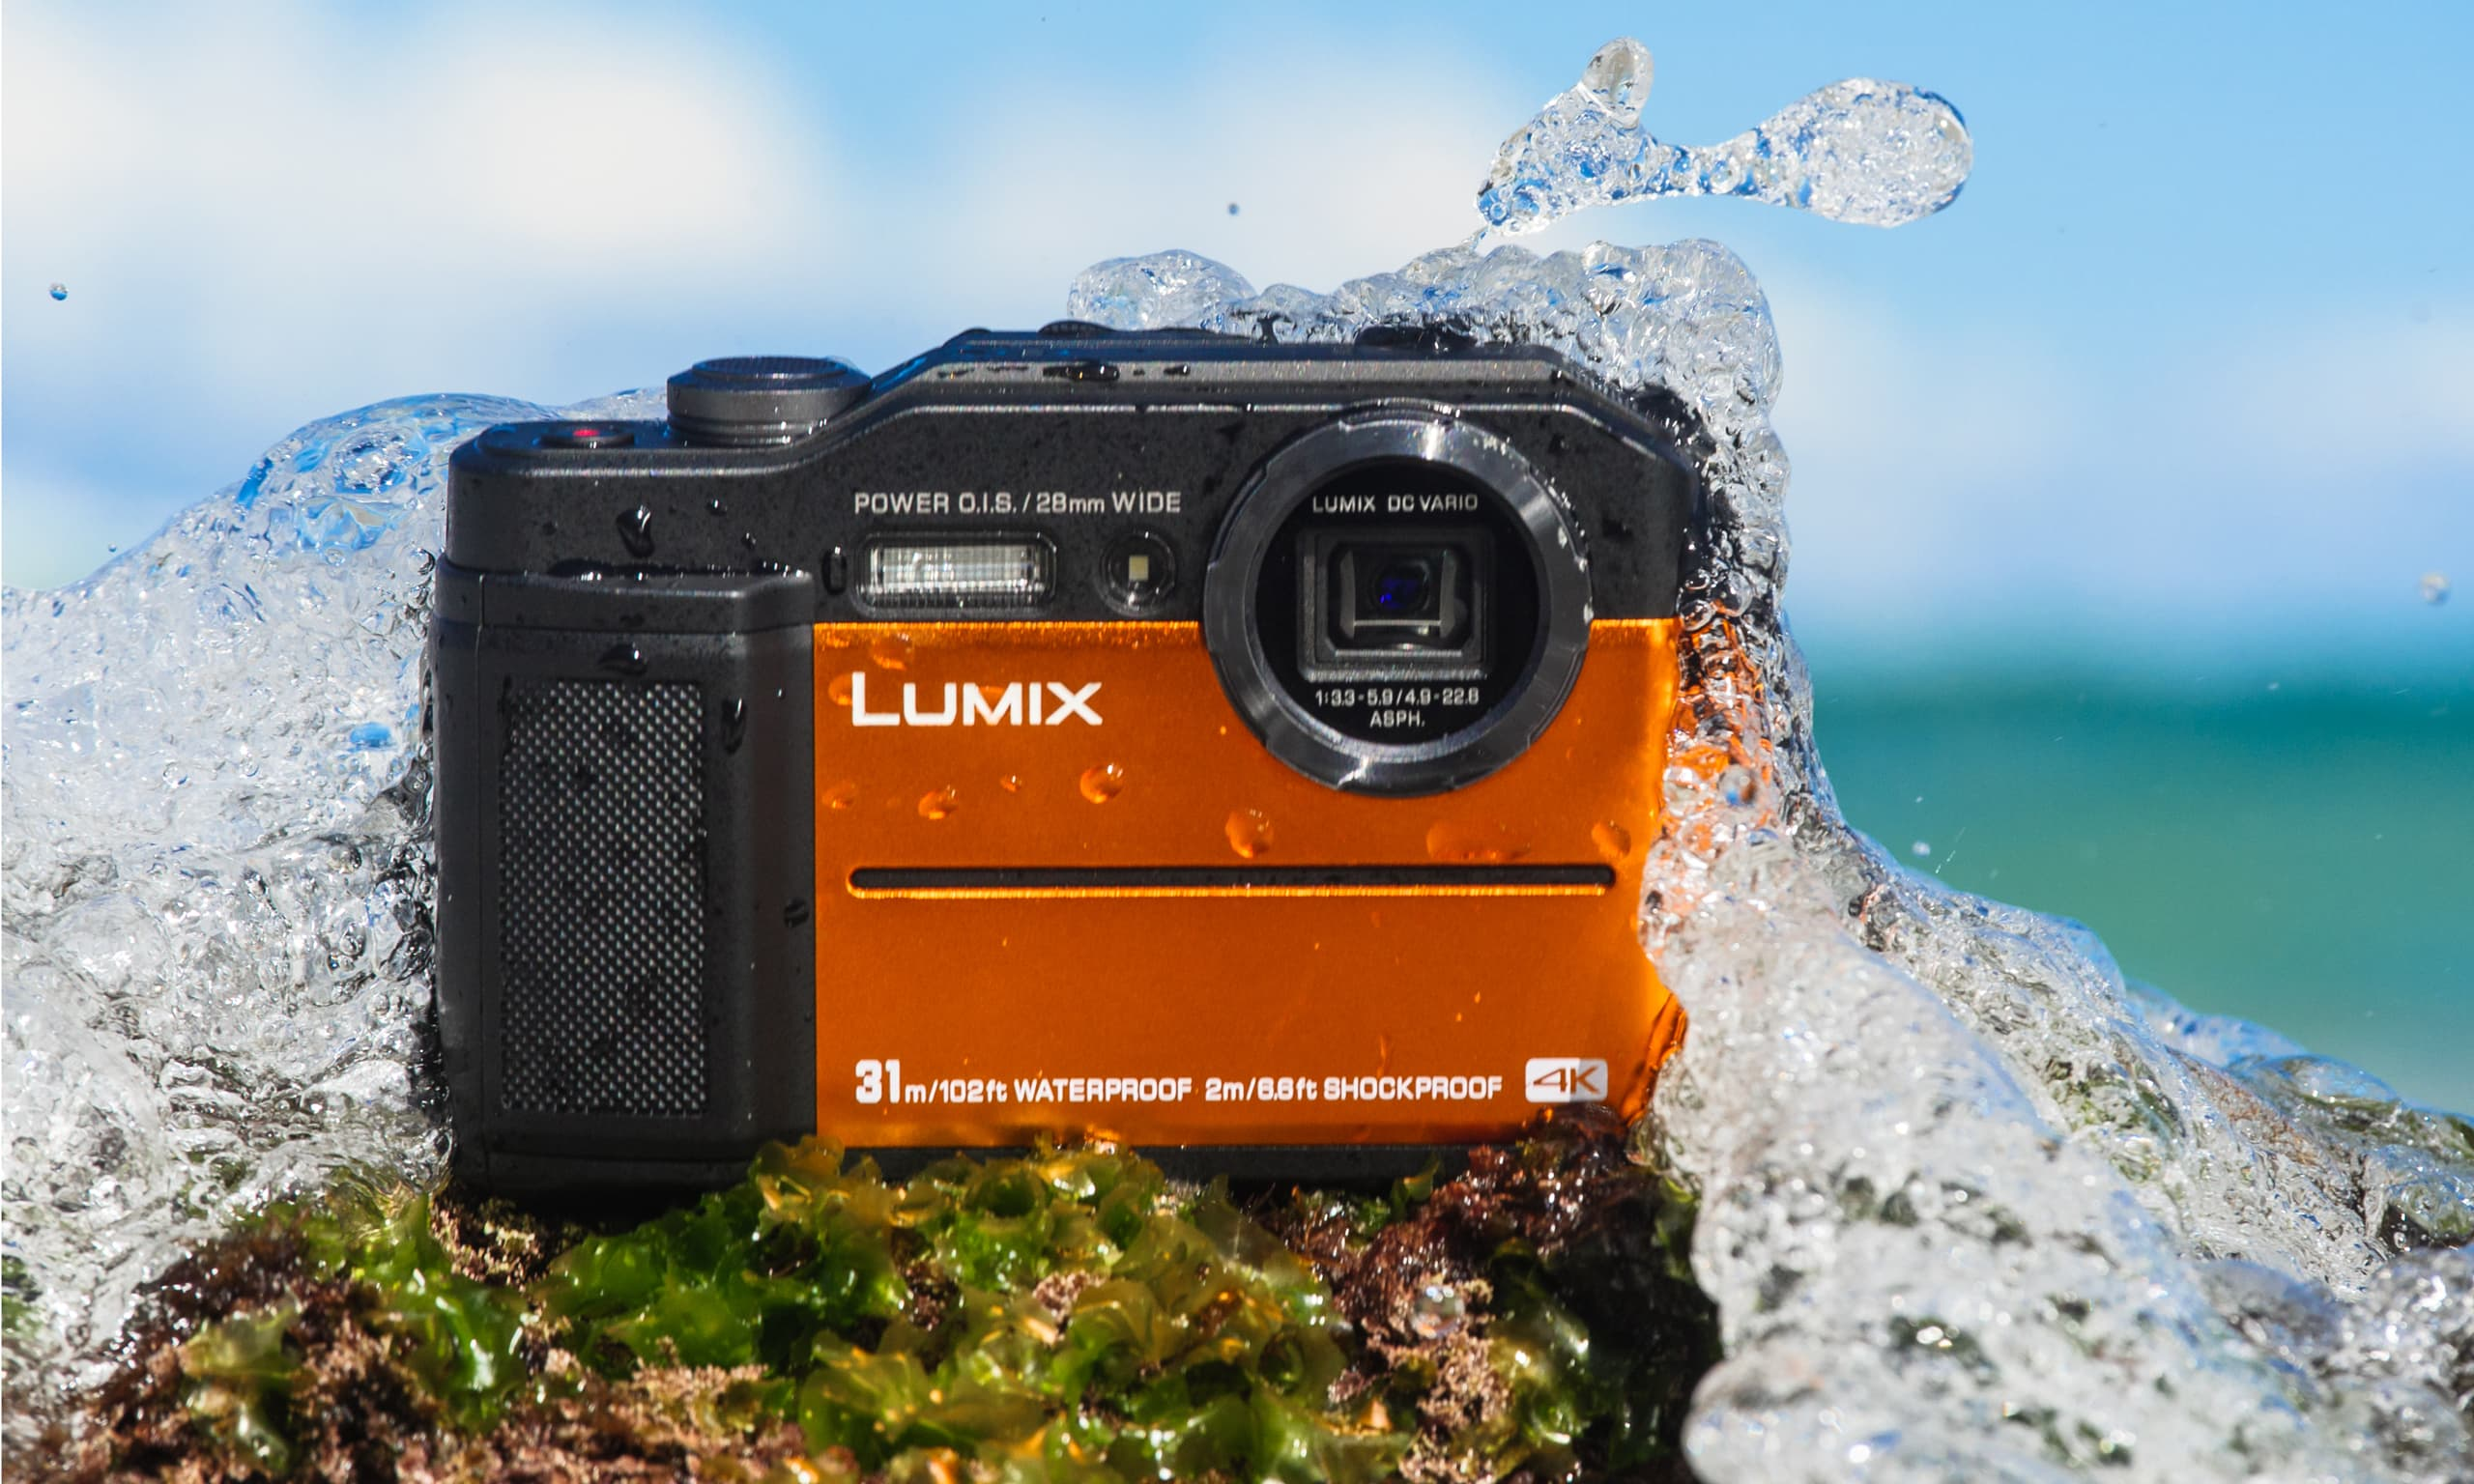 lumix, FT7, lumix FT7, rugged, panasonic